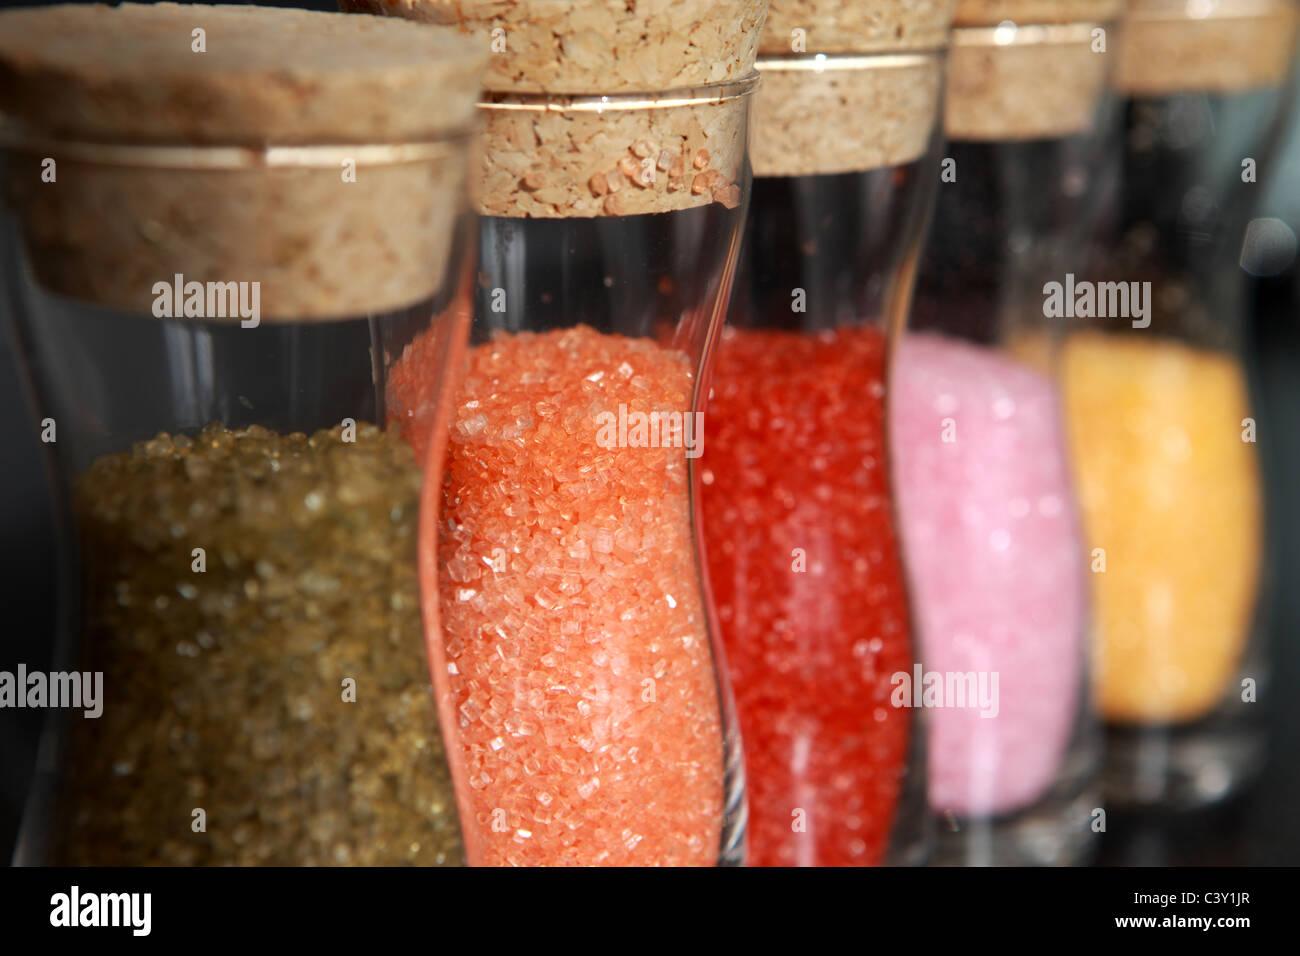 Coloured sugar in glass jars - Stock Image